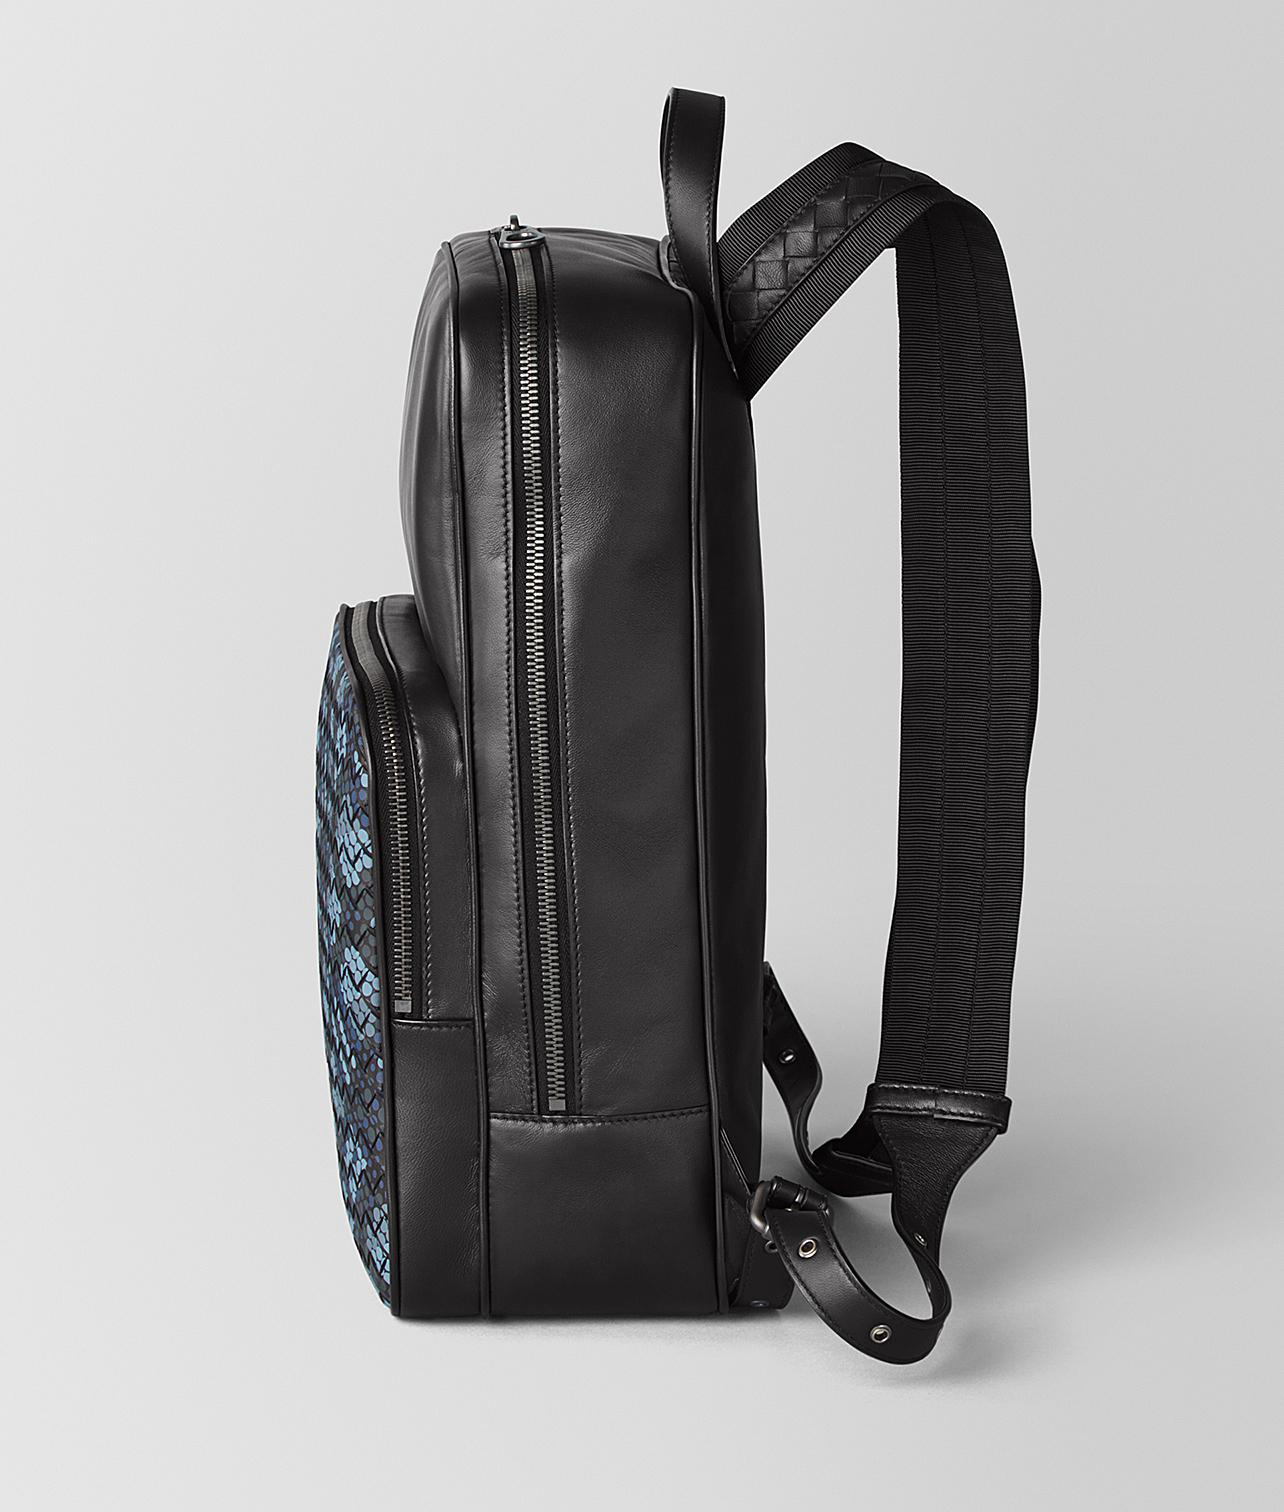 Lyst - Bottega Veneta Medium Double Brick Backpack In Tartan Dots in Black  for Men 553e0e6b81bf1